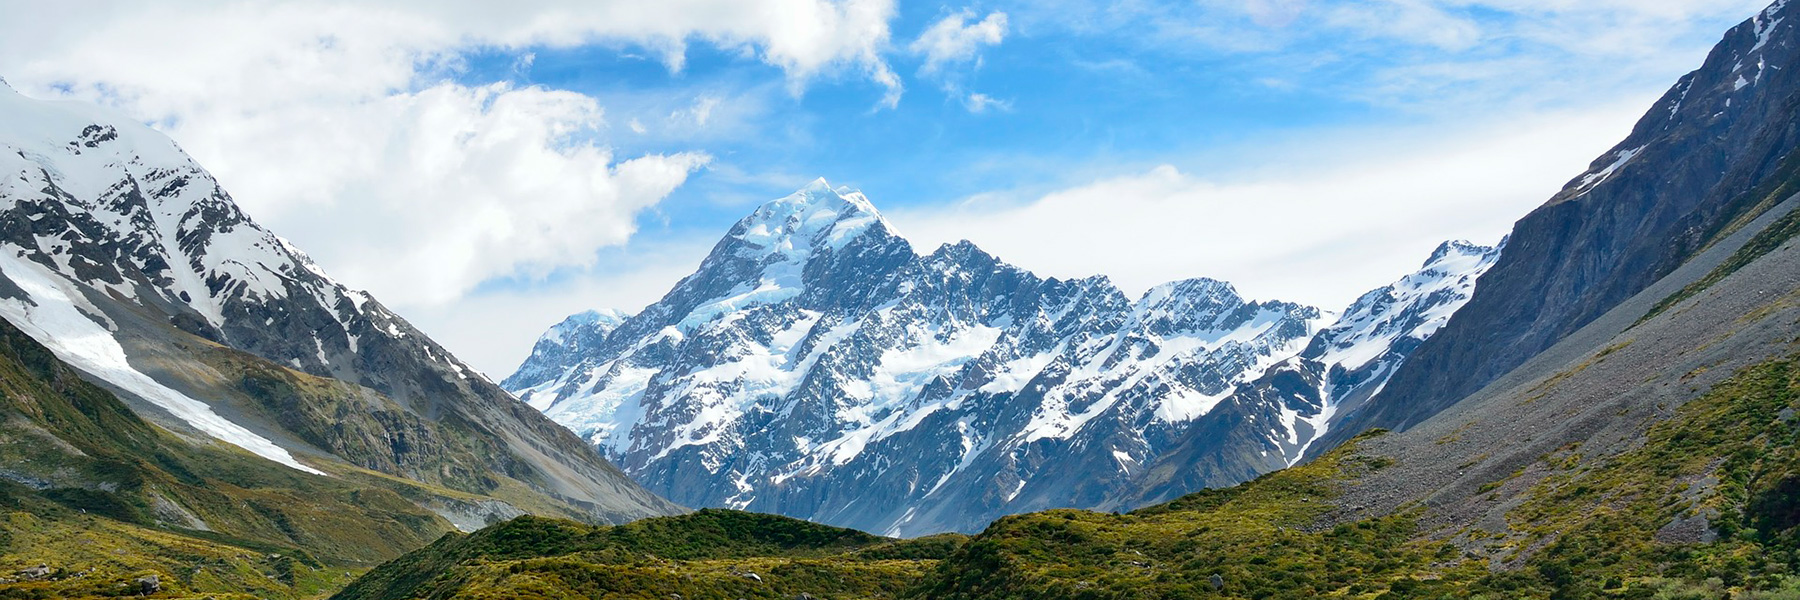 Rejsecenter Djursland | New Zealand